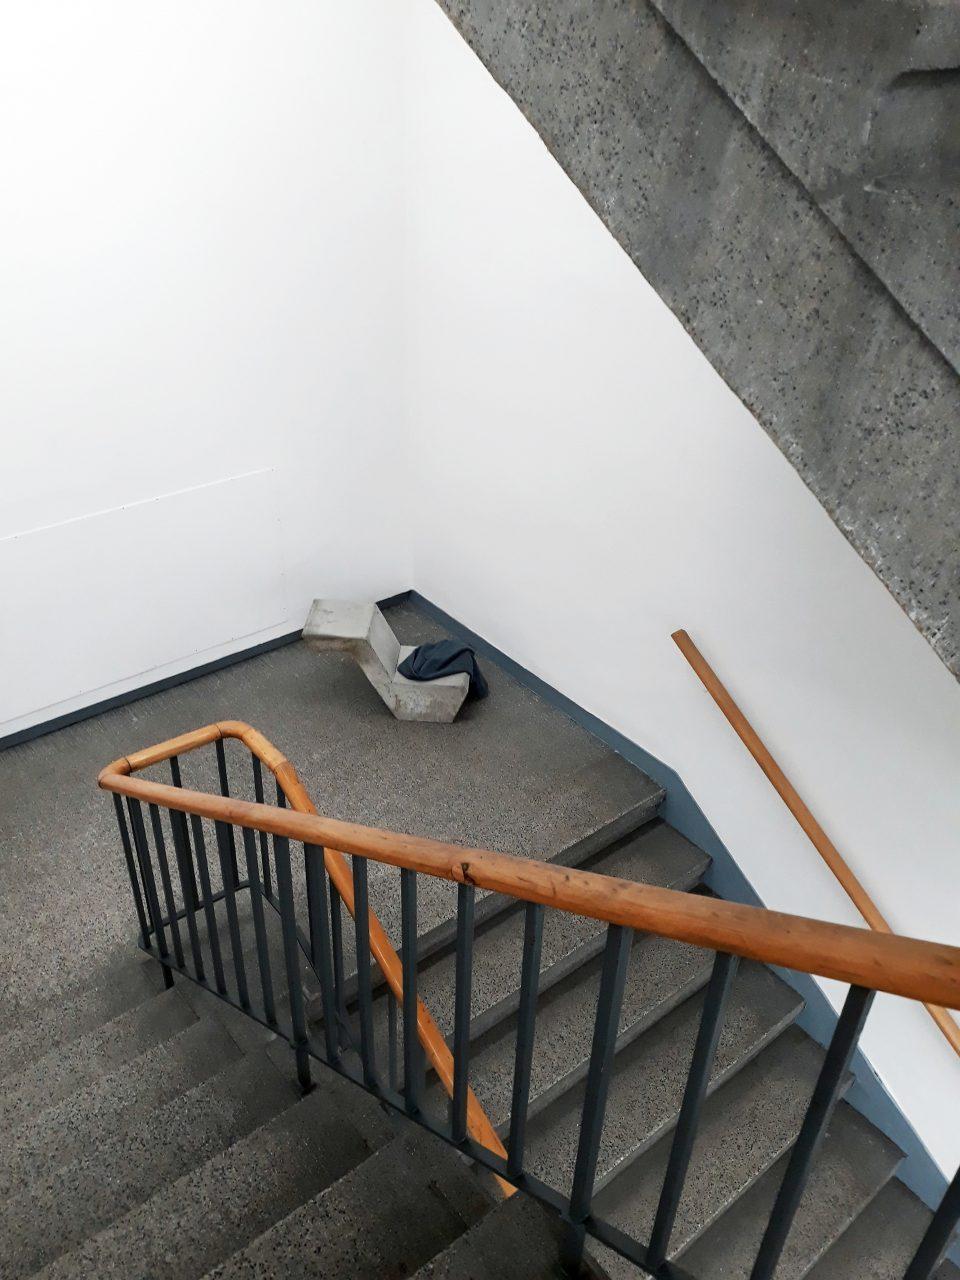 Hannah Hallermann   Startblock 1   2017   Kunsthalle Recklinghausen   Kunstpreis Skulptur junger Westen